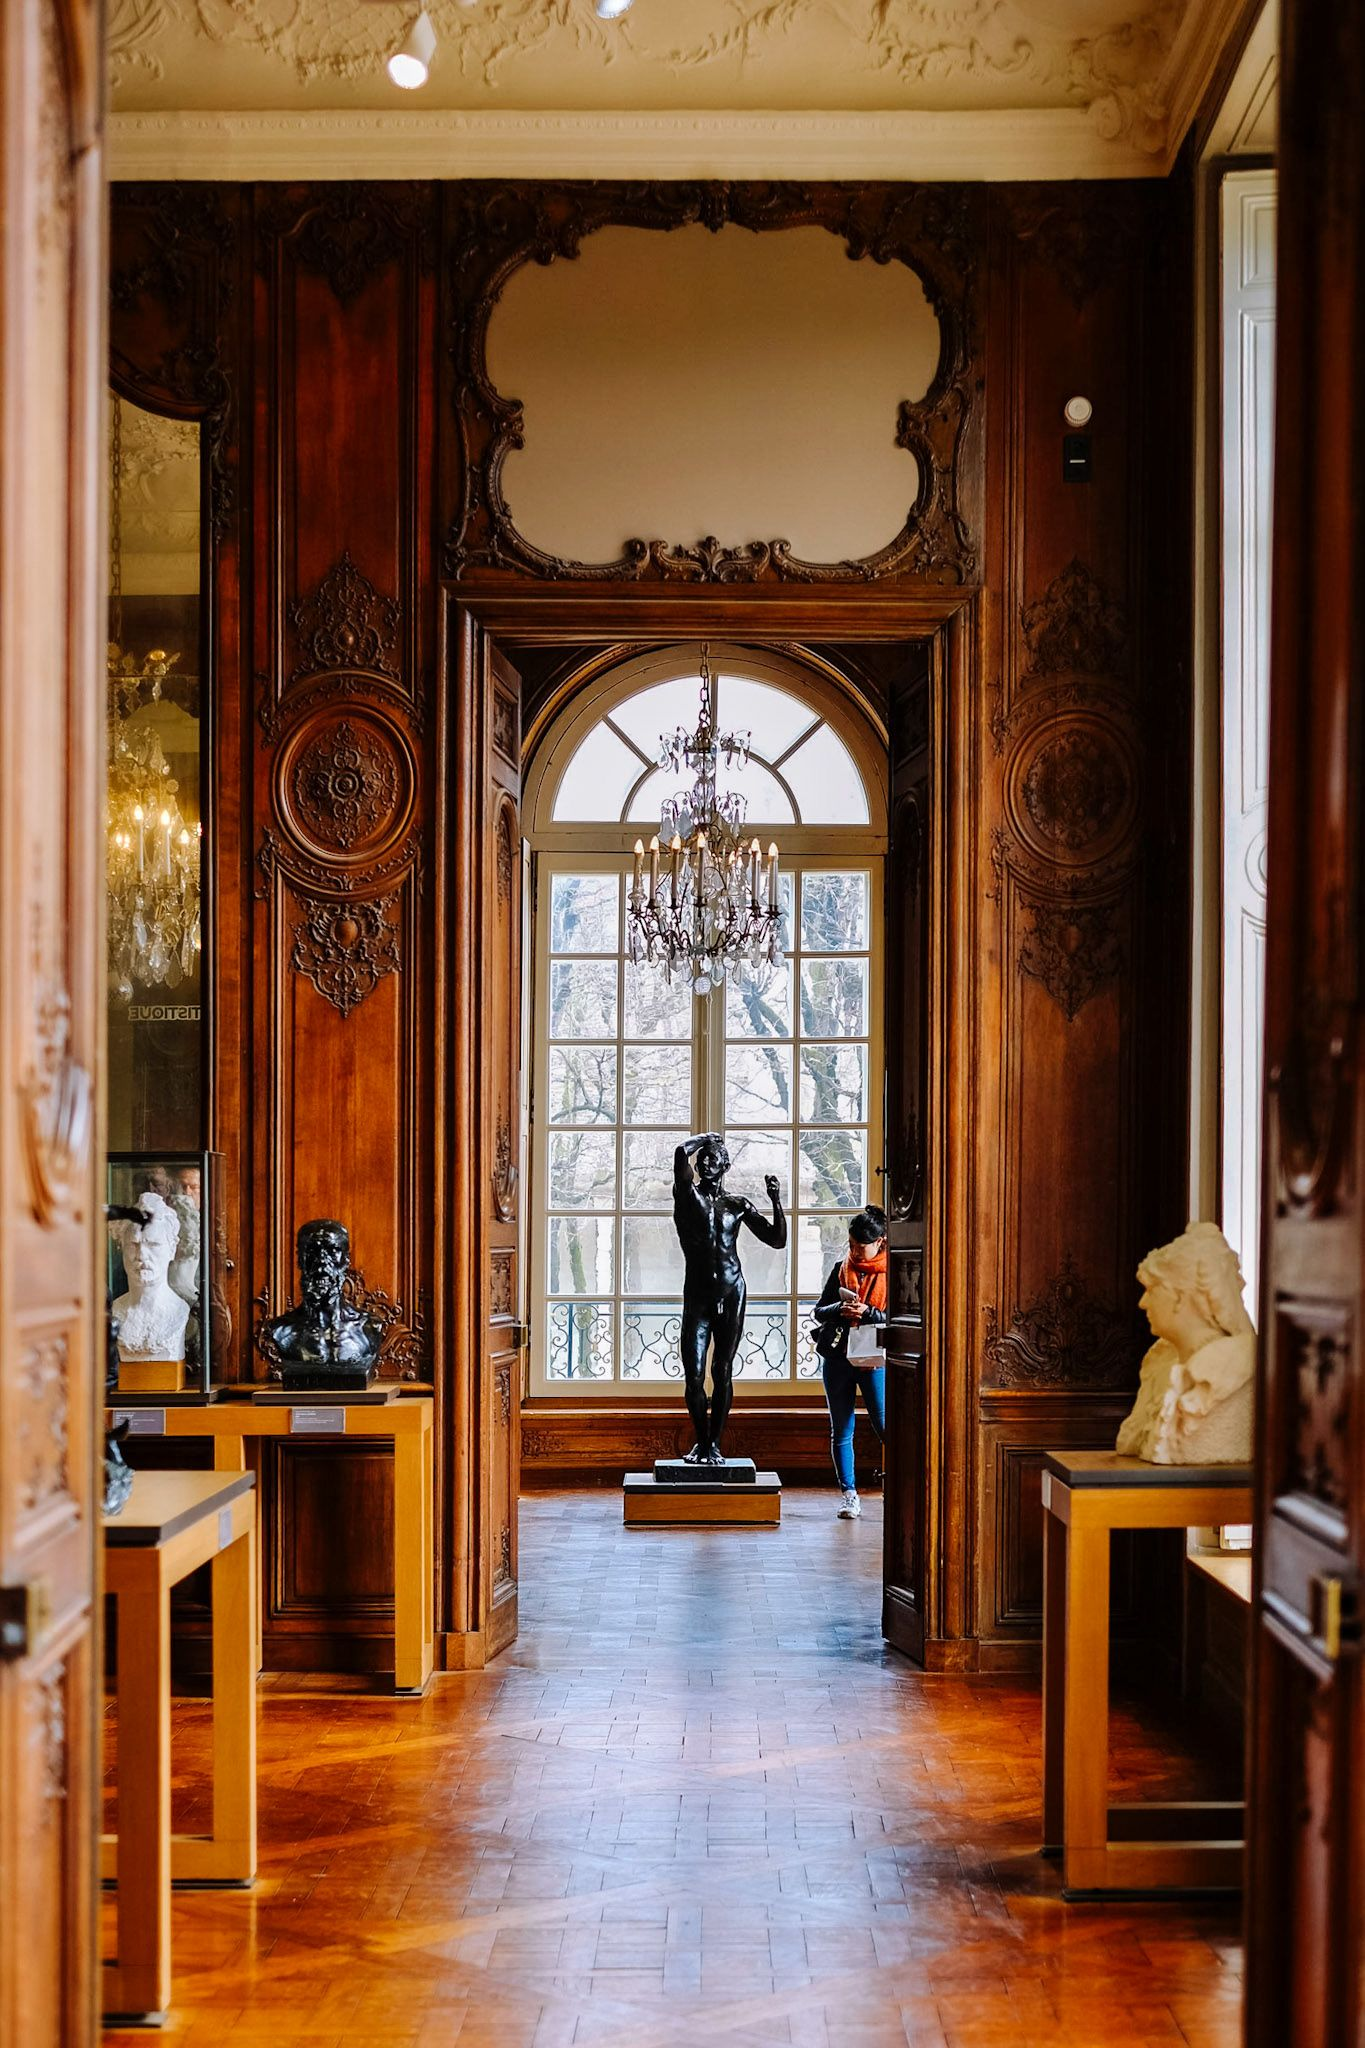 Hotel Biron interior at the Rodin Museum